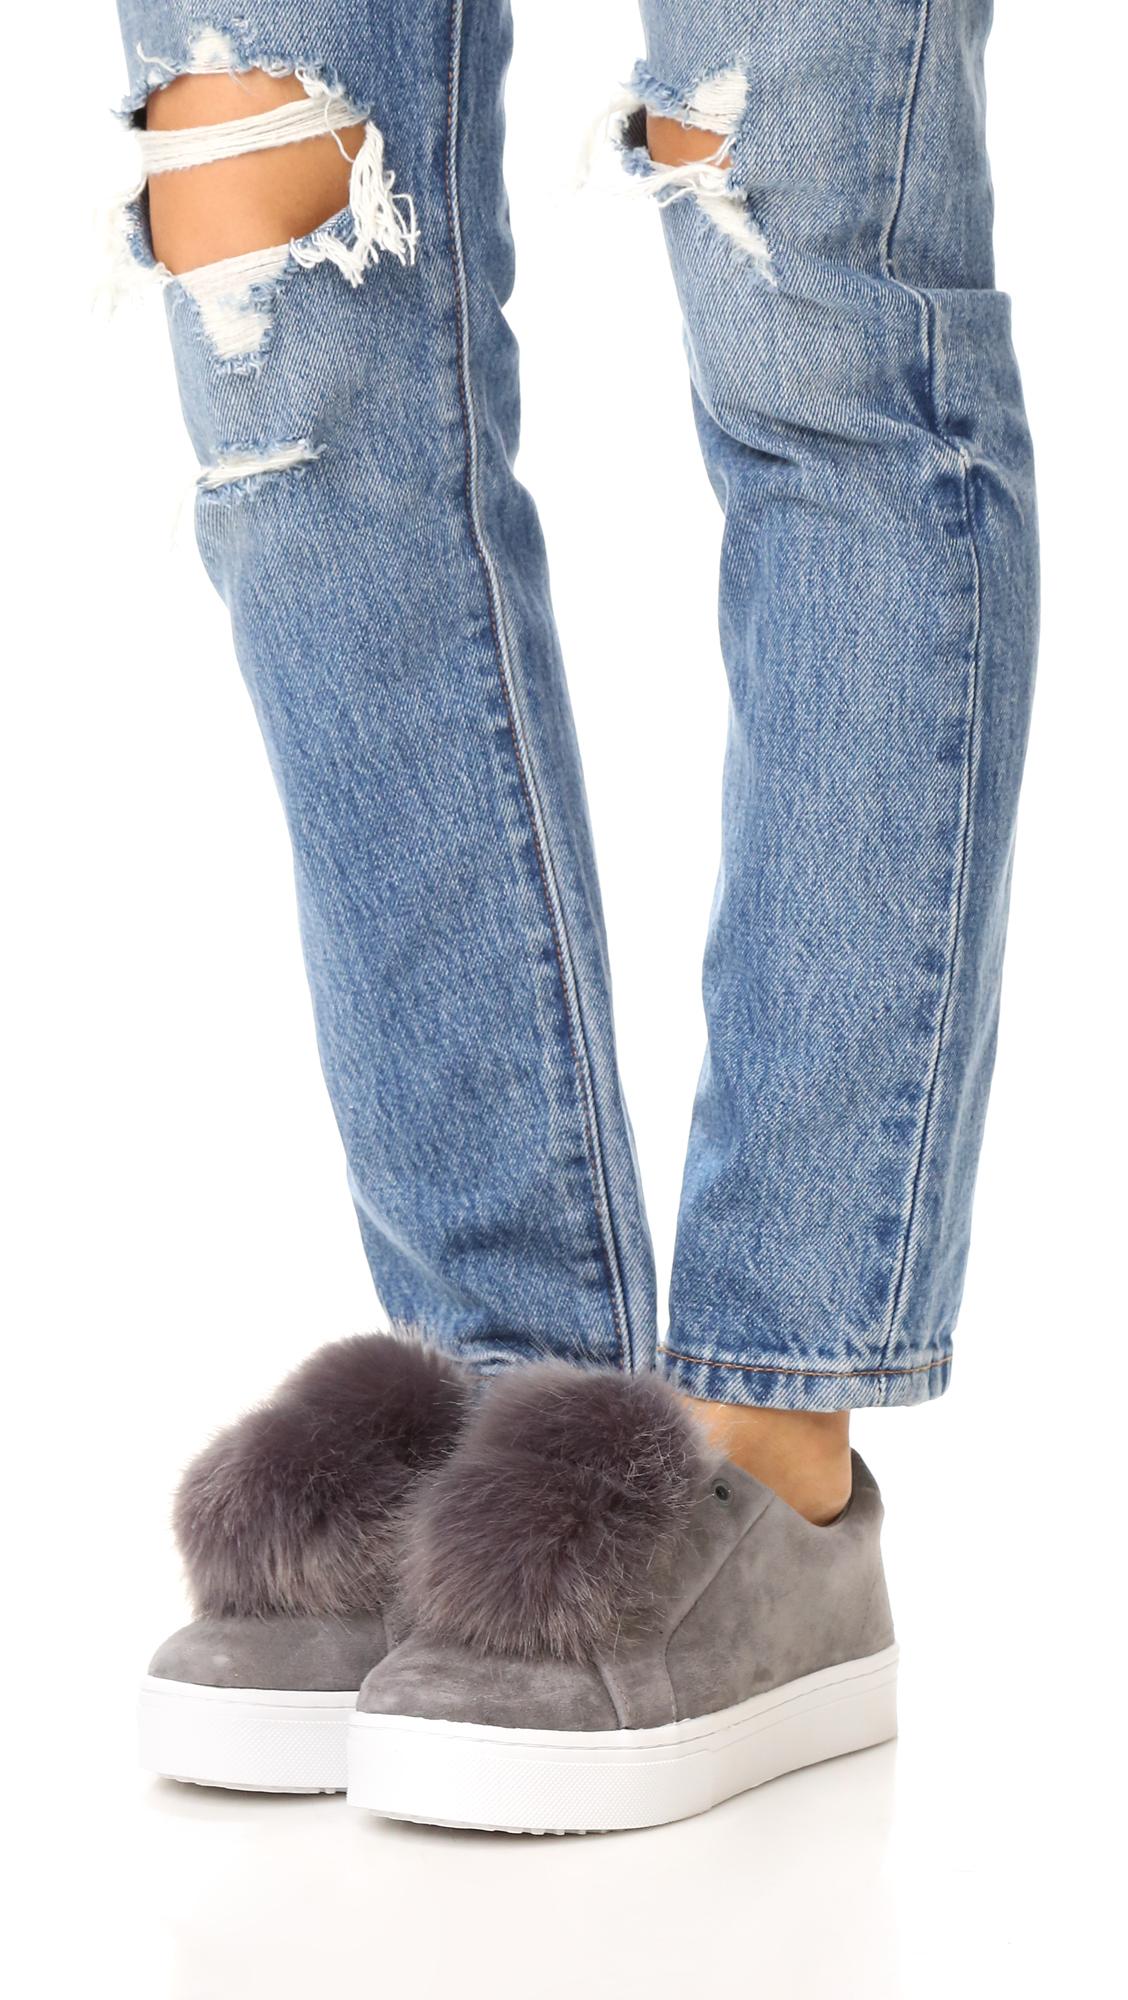 66197508a732 Sam Edelman Leya Faux Fur Pom Pom Sneakers